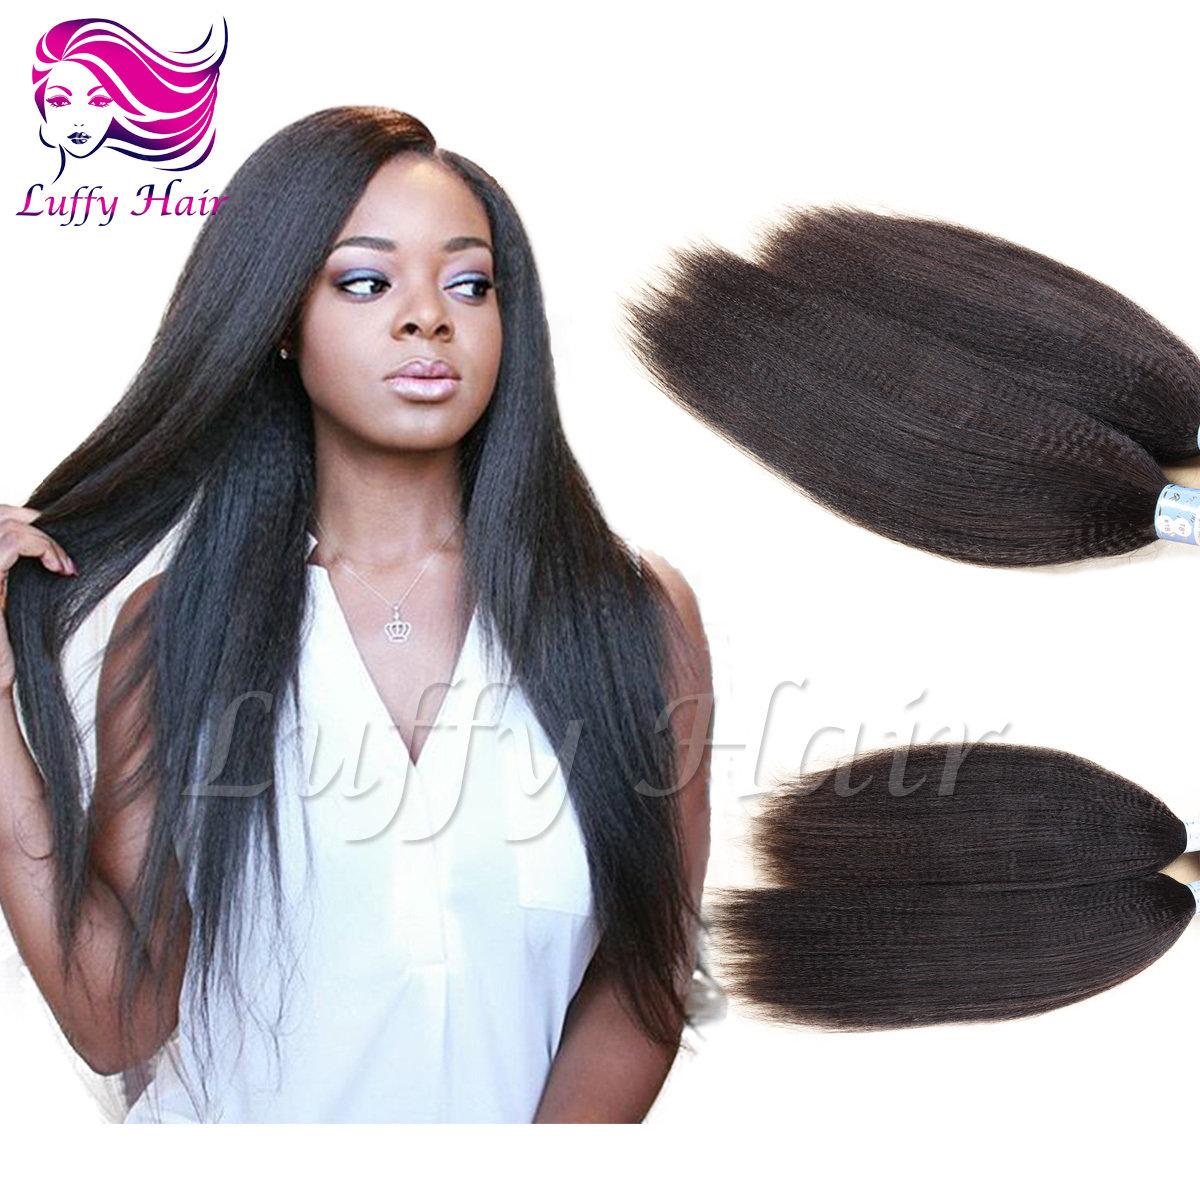 8A Virgin Human Hair Italian Yaki Straight Tape In Hair Extensions - KTL010